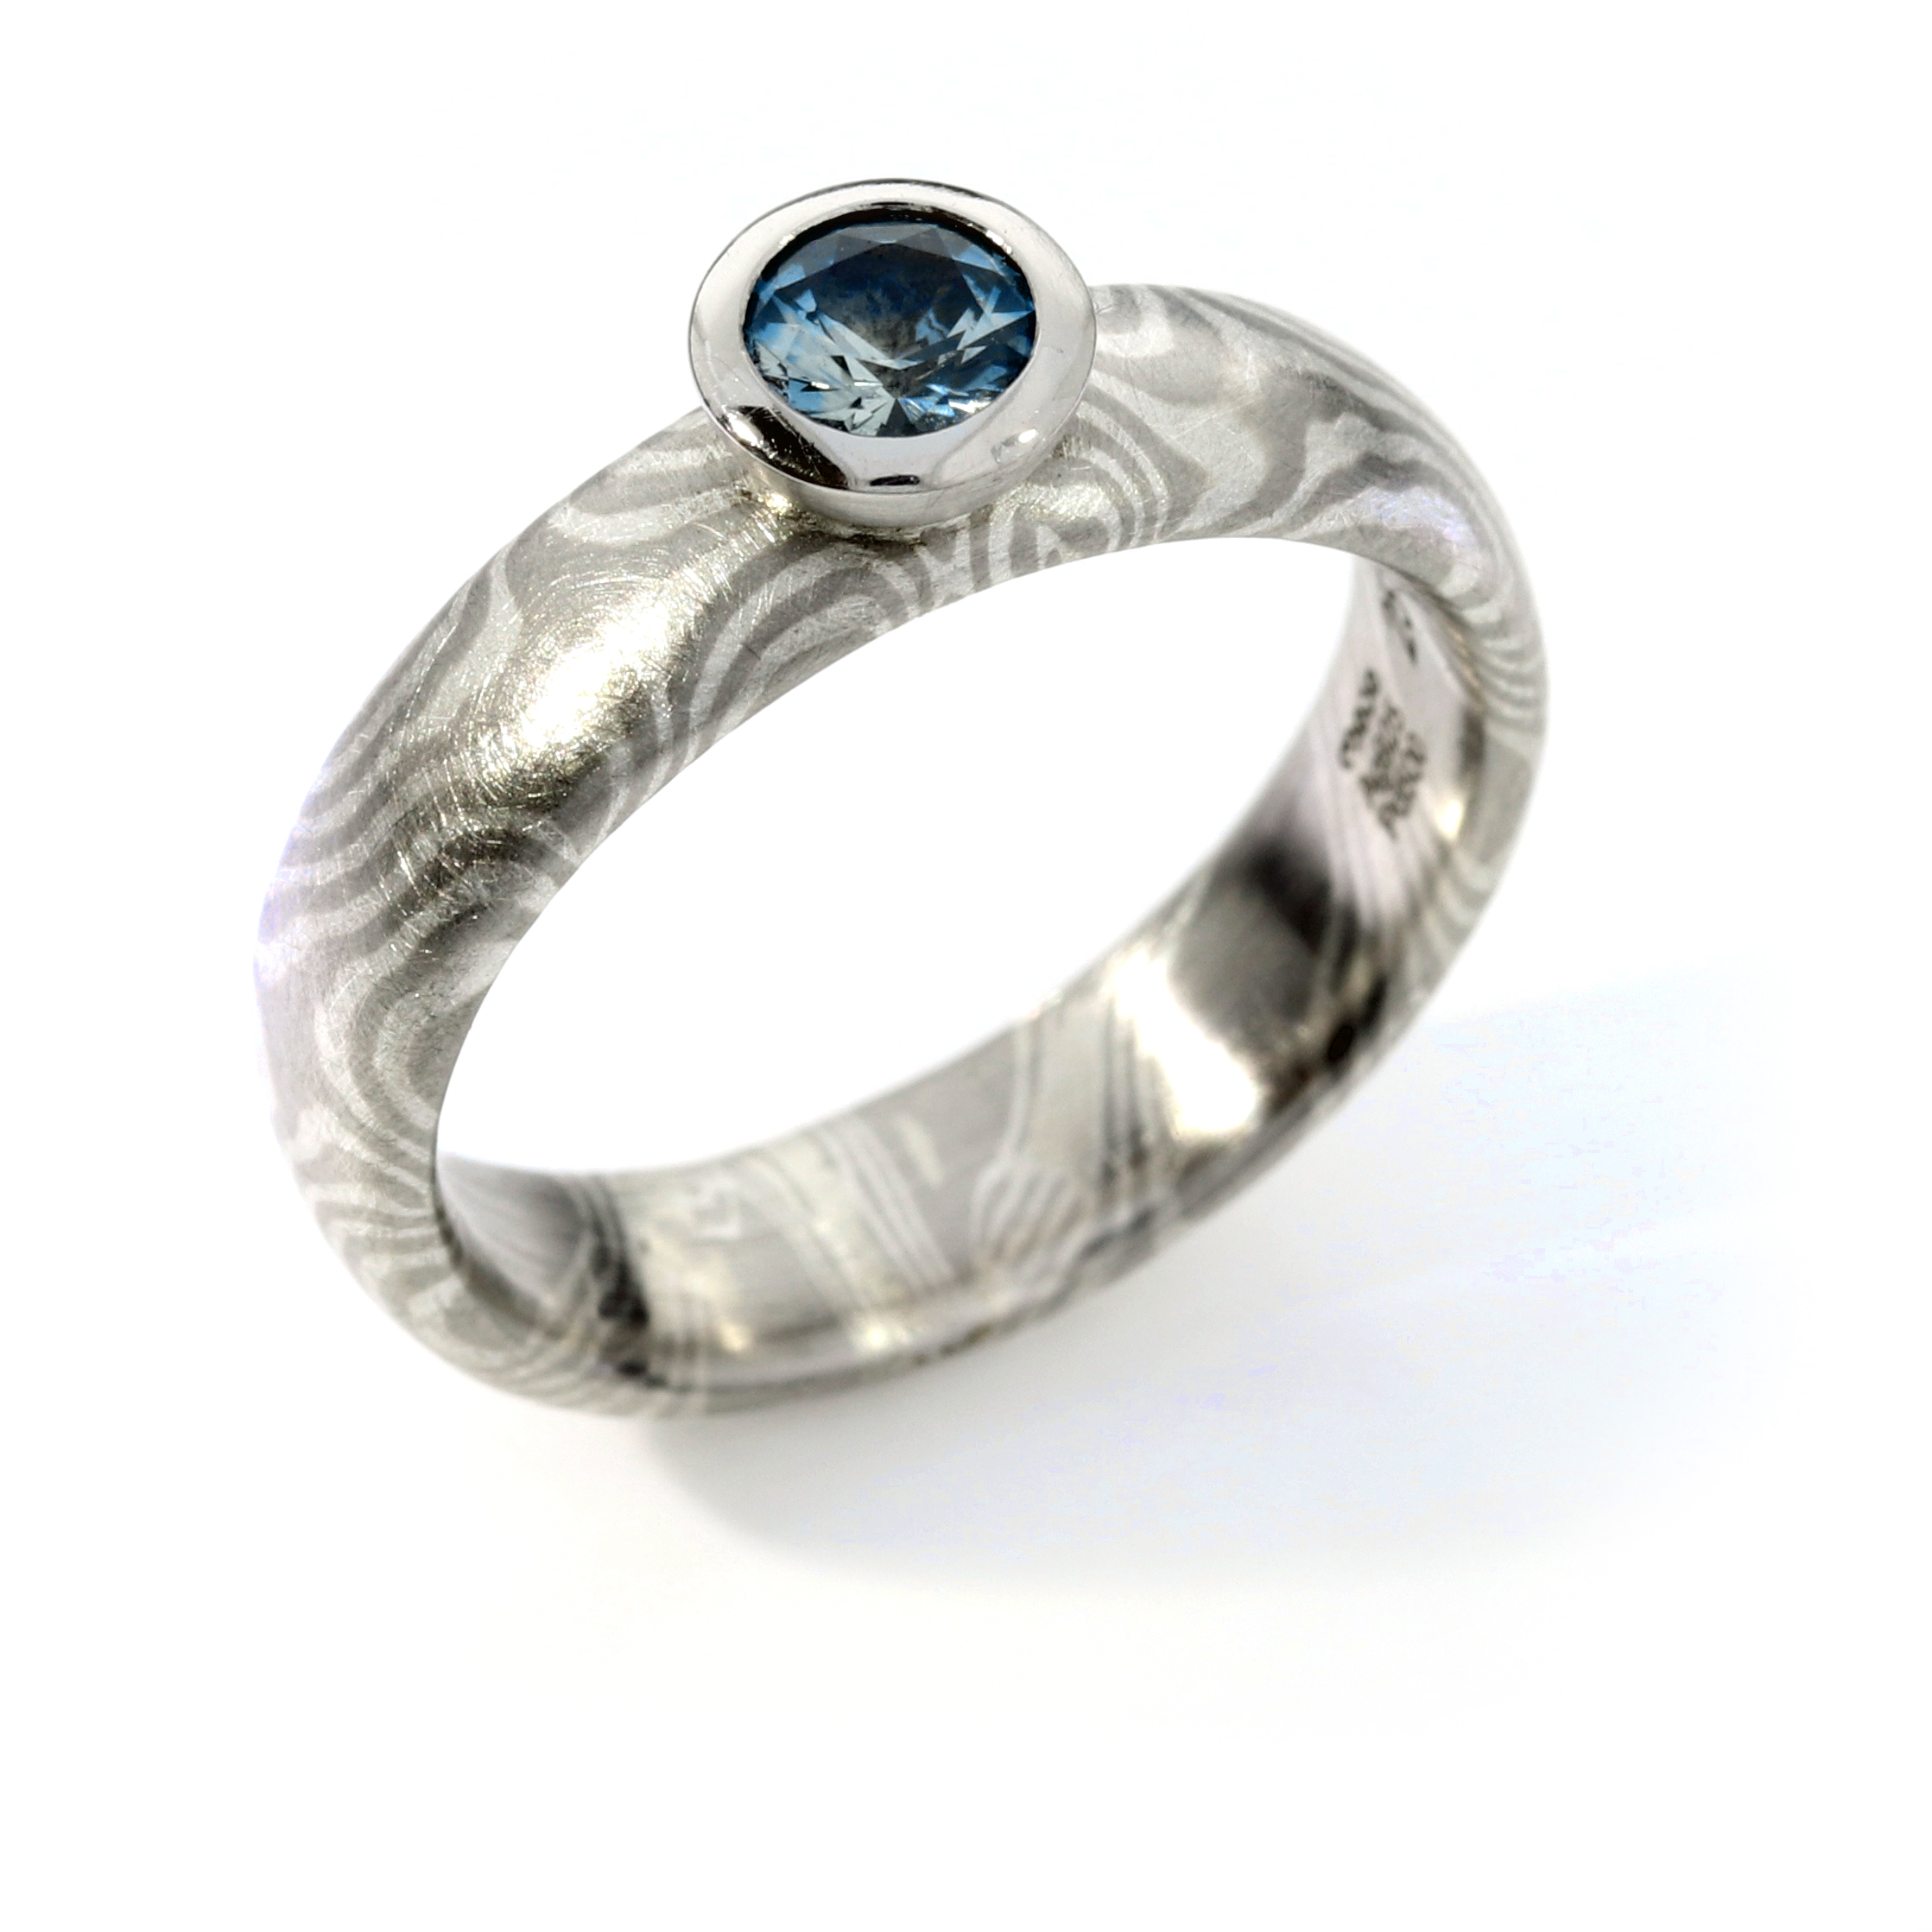 Verlobungsring Mokume Gane Silber Palladium Saphir (251144)